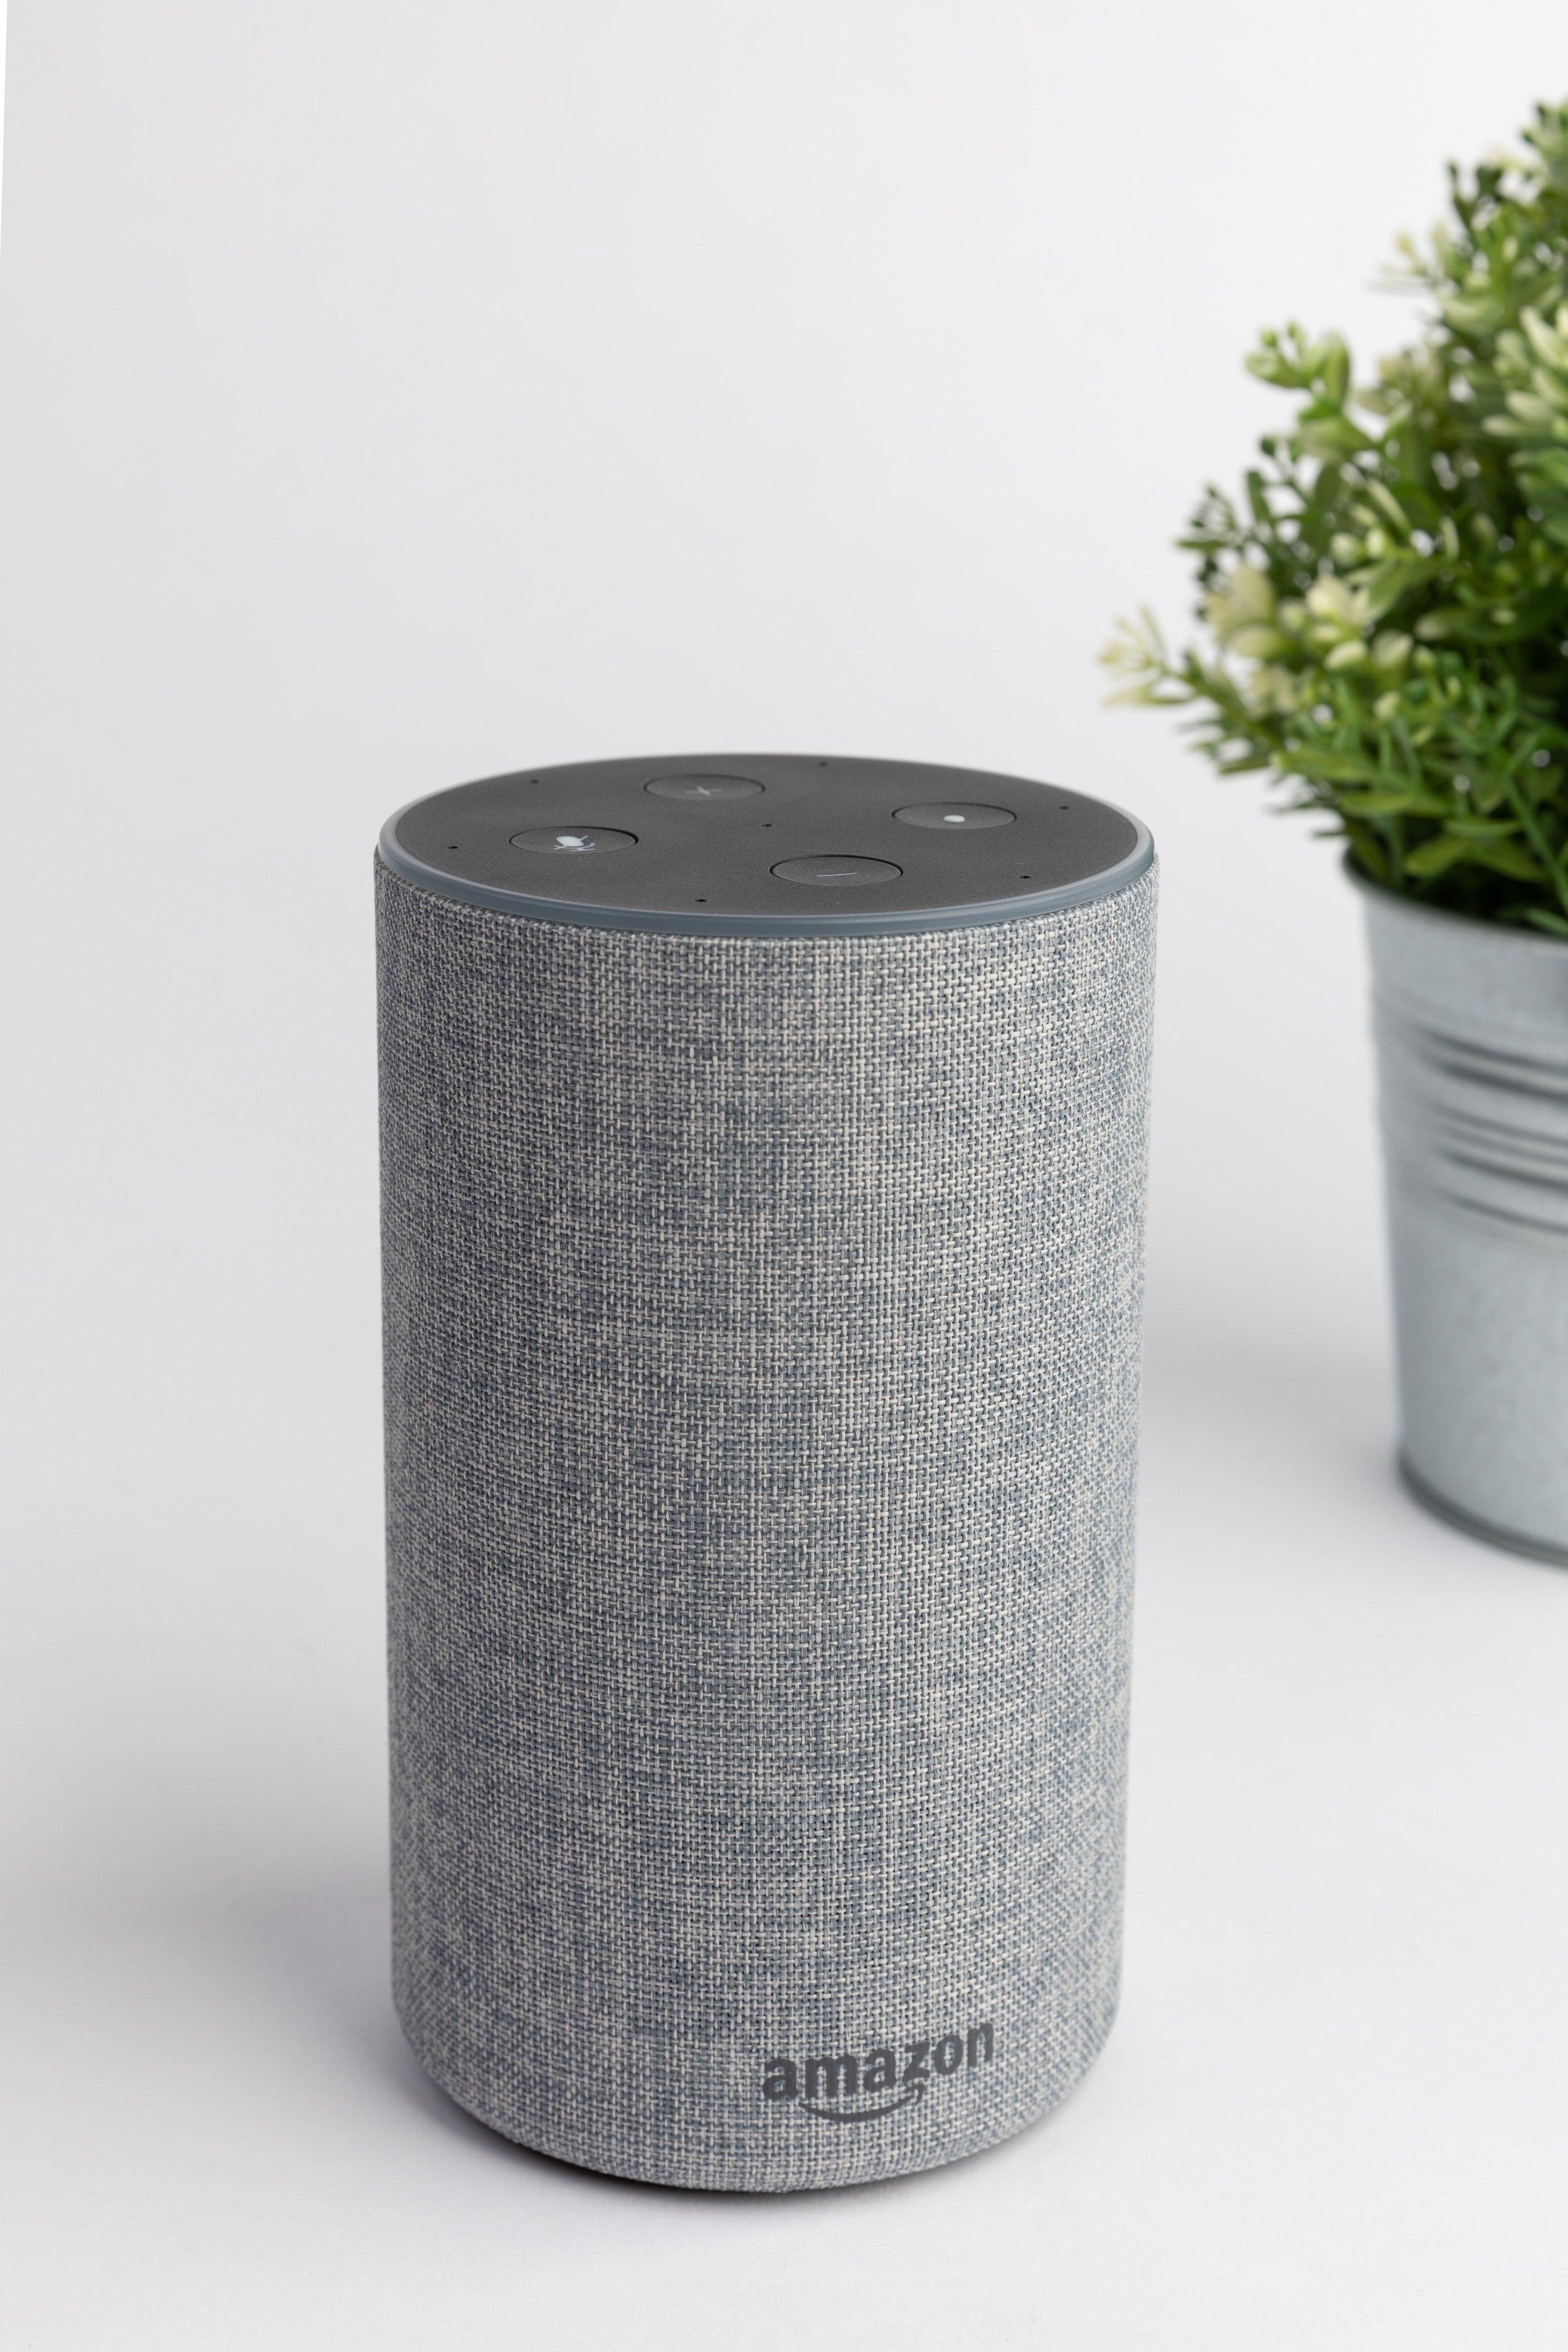 amazon-echo-heather-grey-speaker.jpg